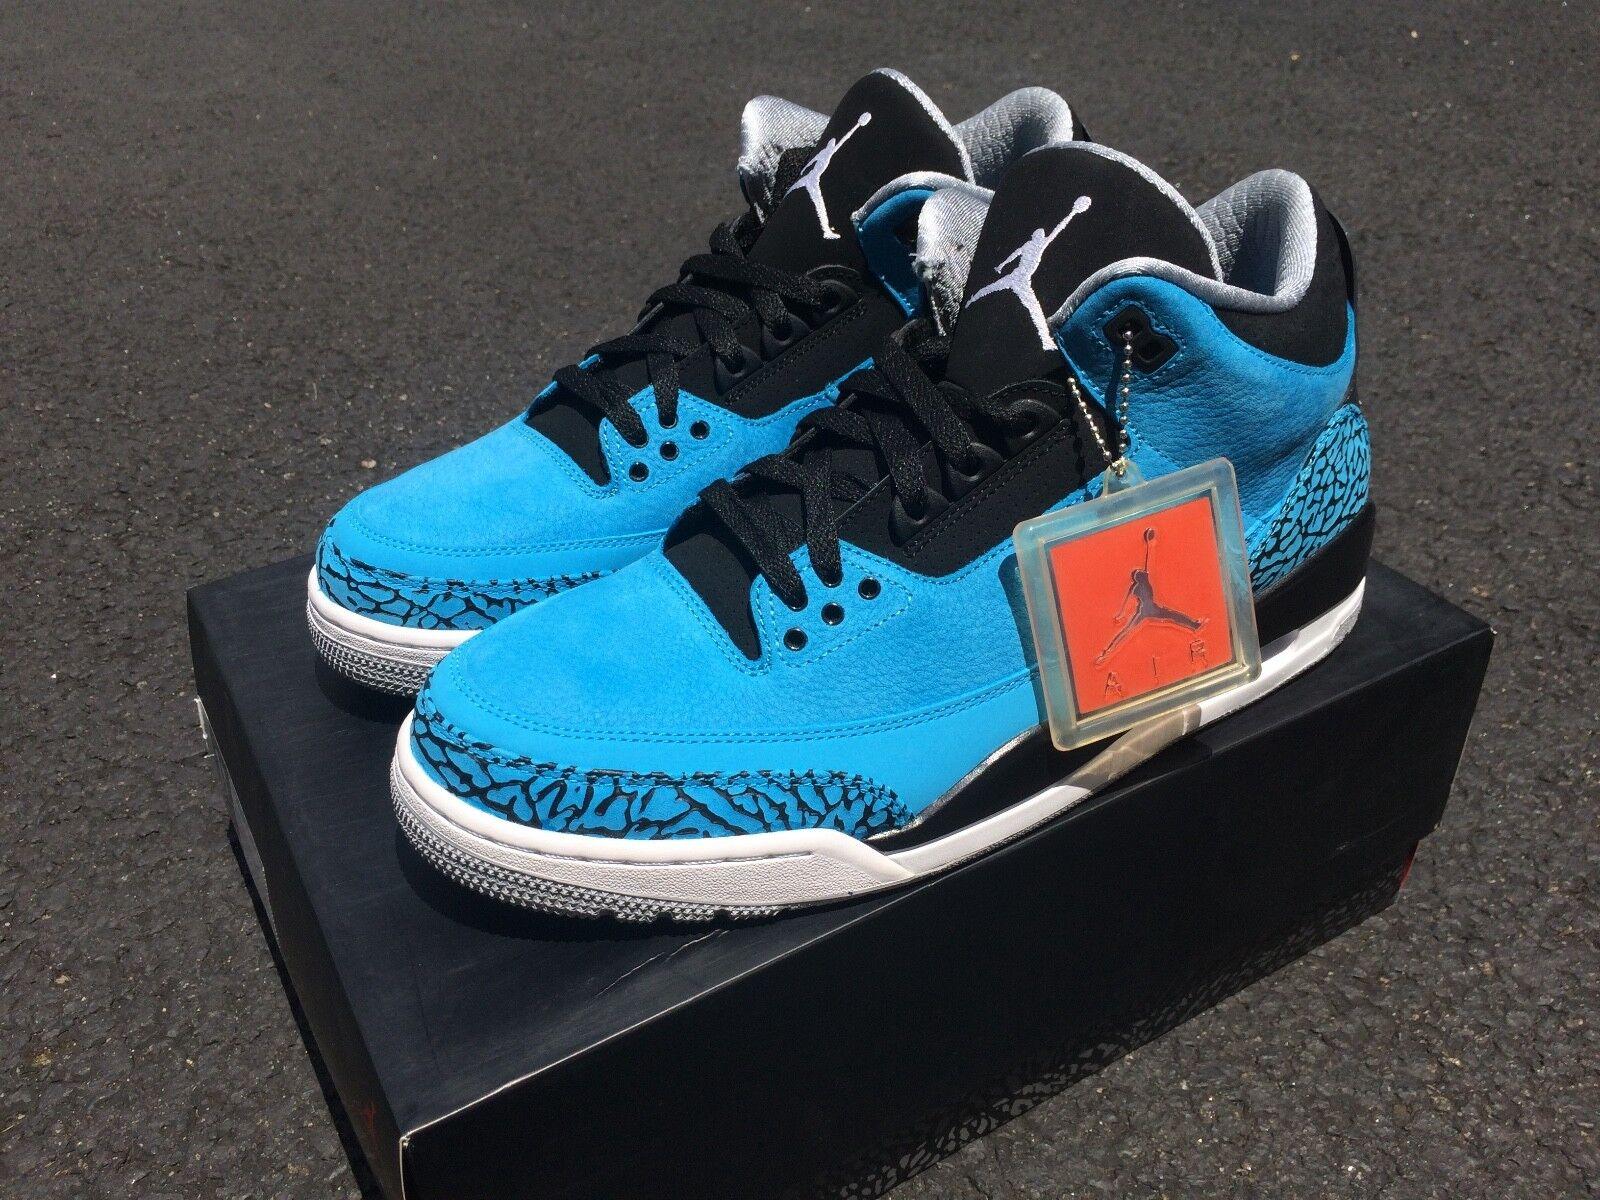 sneakers for cheap 0b6a0 890c8 Nike Nike Nike Air Jordan 3 Powder Blue Size 11 DS 49e0e5